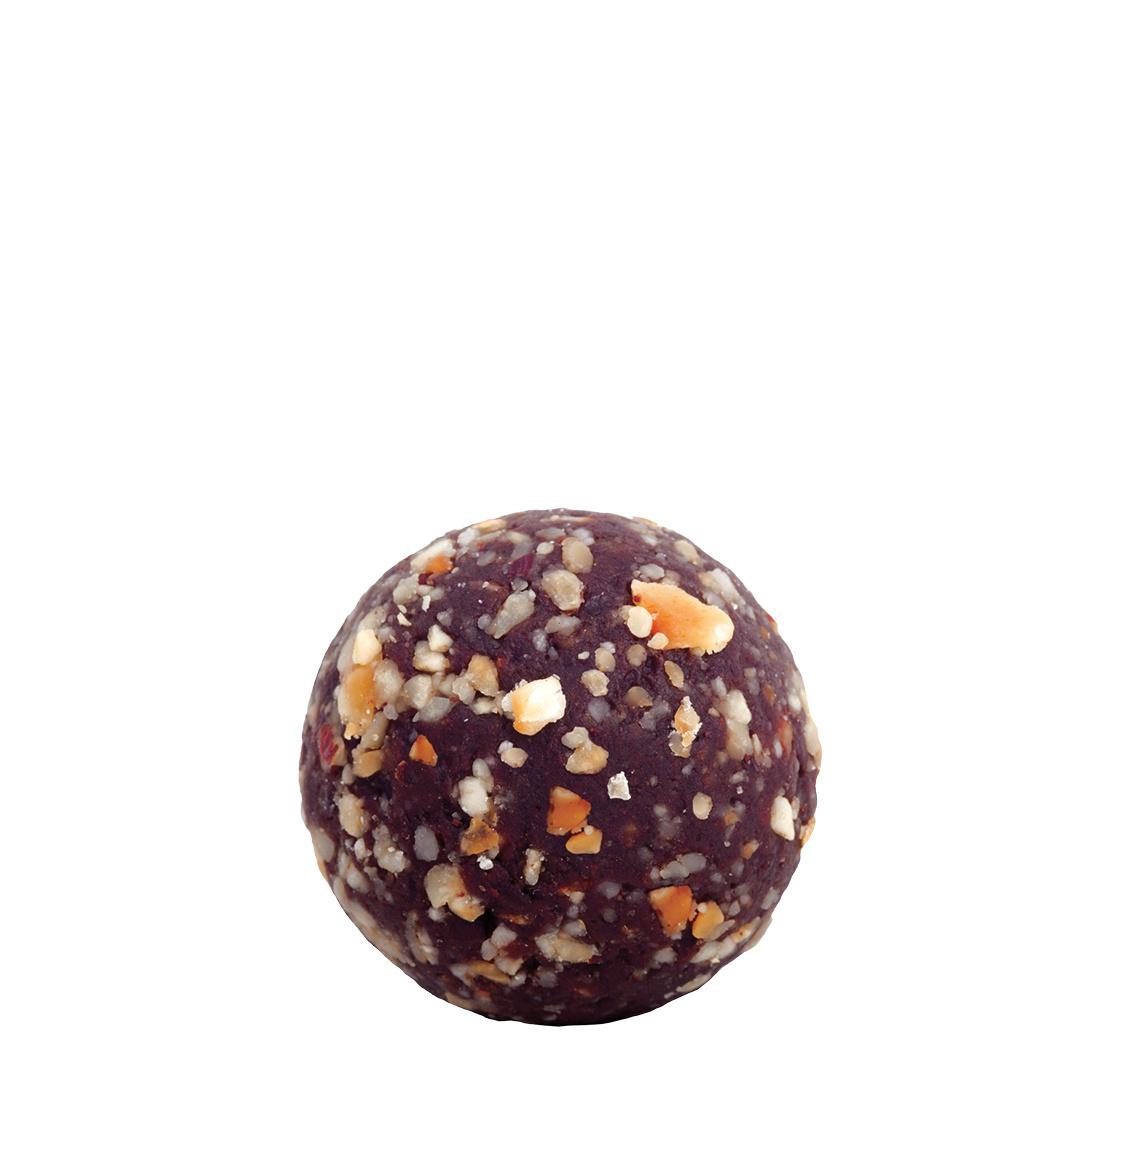 Kate Percy's Go Bites Hazelnut And Cacao 24g